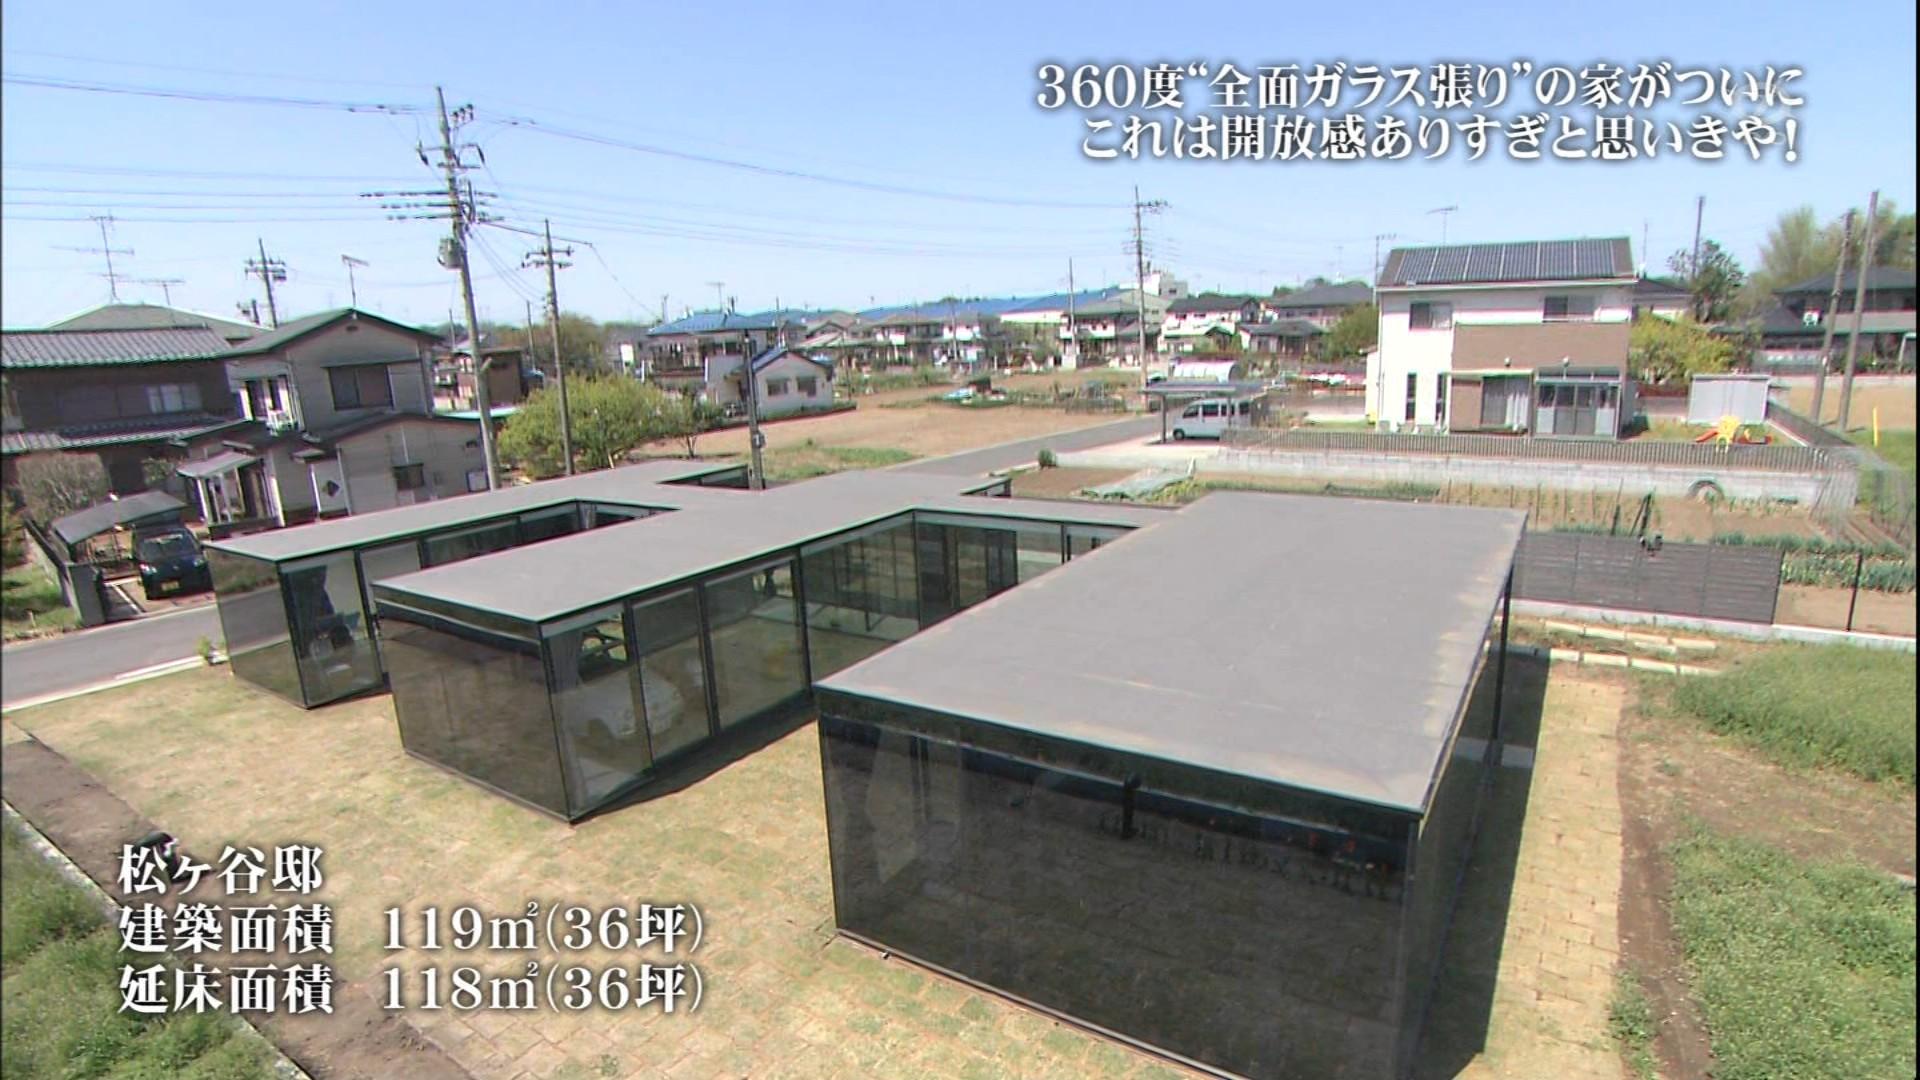 10s1157063.jpg